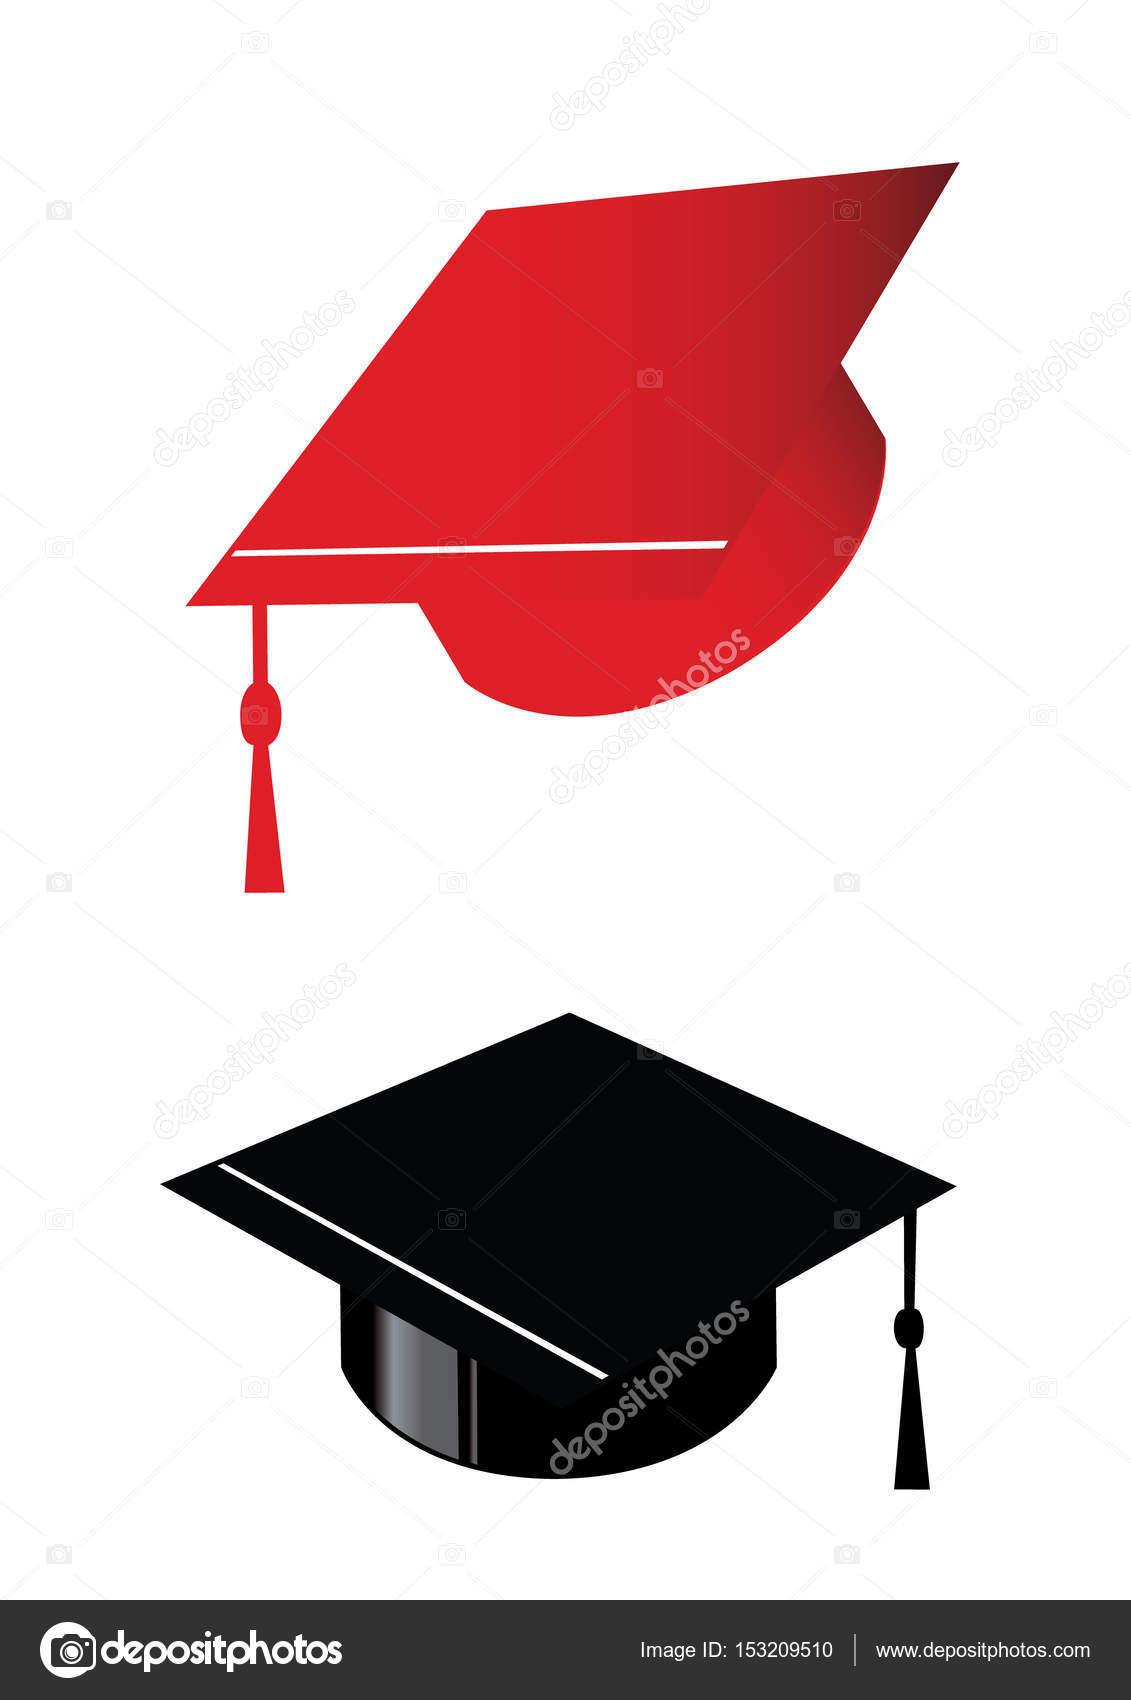 Graduation hats congratulation \u2014 Stock Vector © ekays #153209510